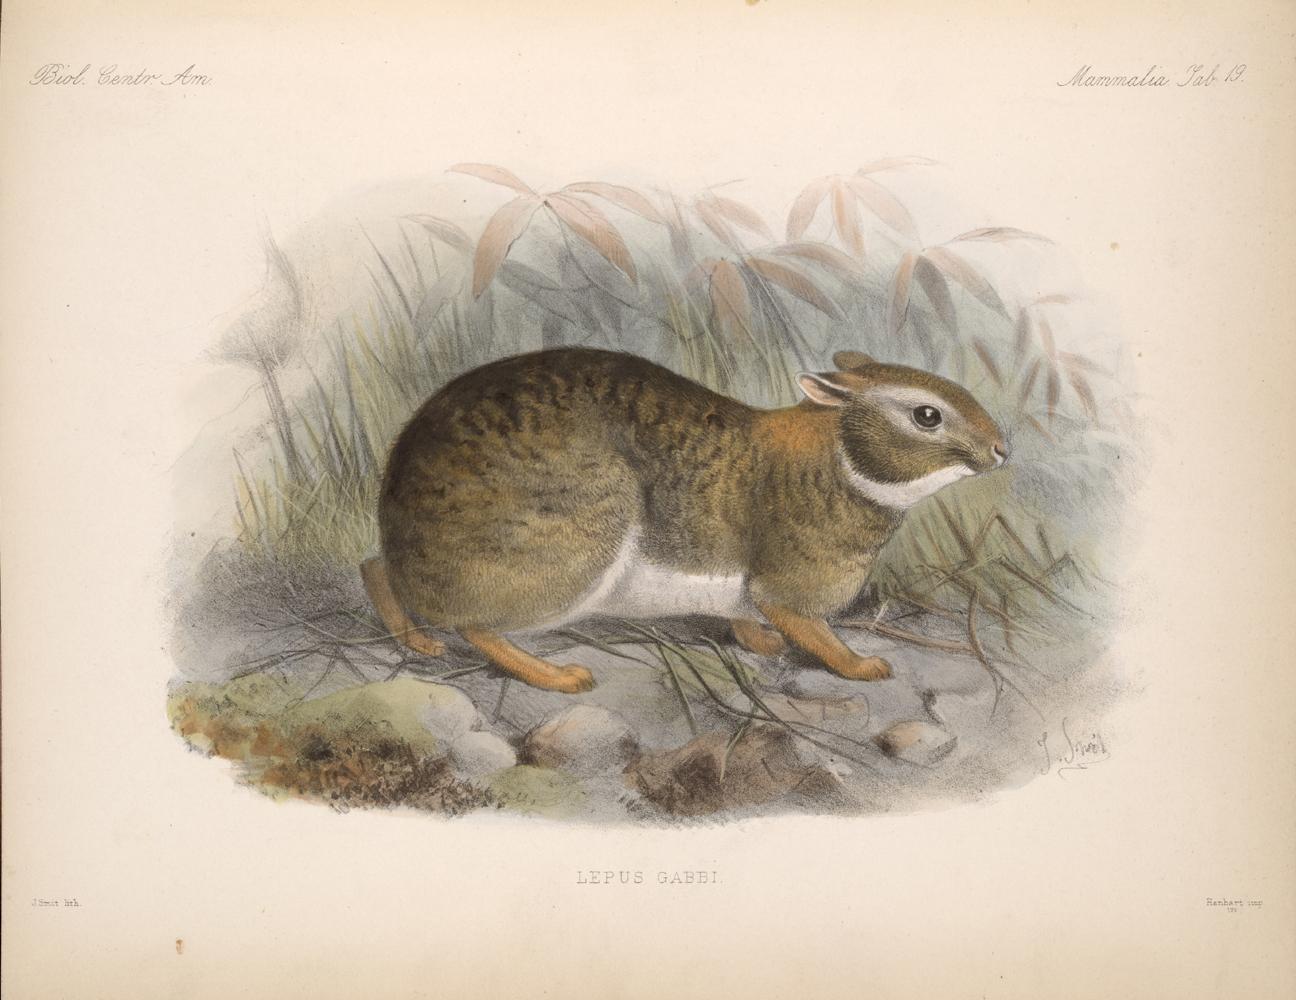 Mammals,  Image number:bca_02_00_00_285